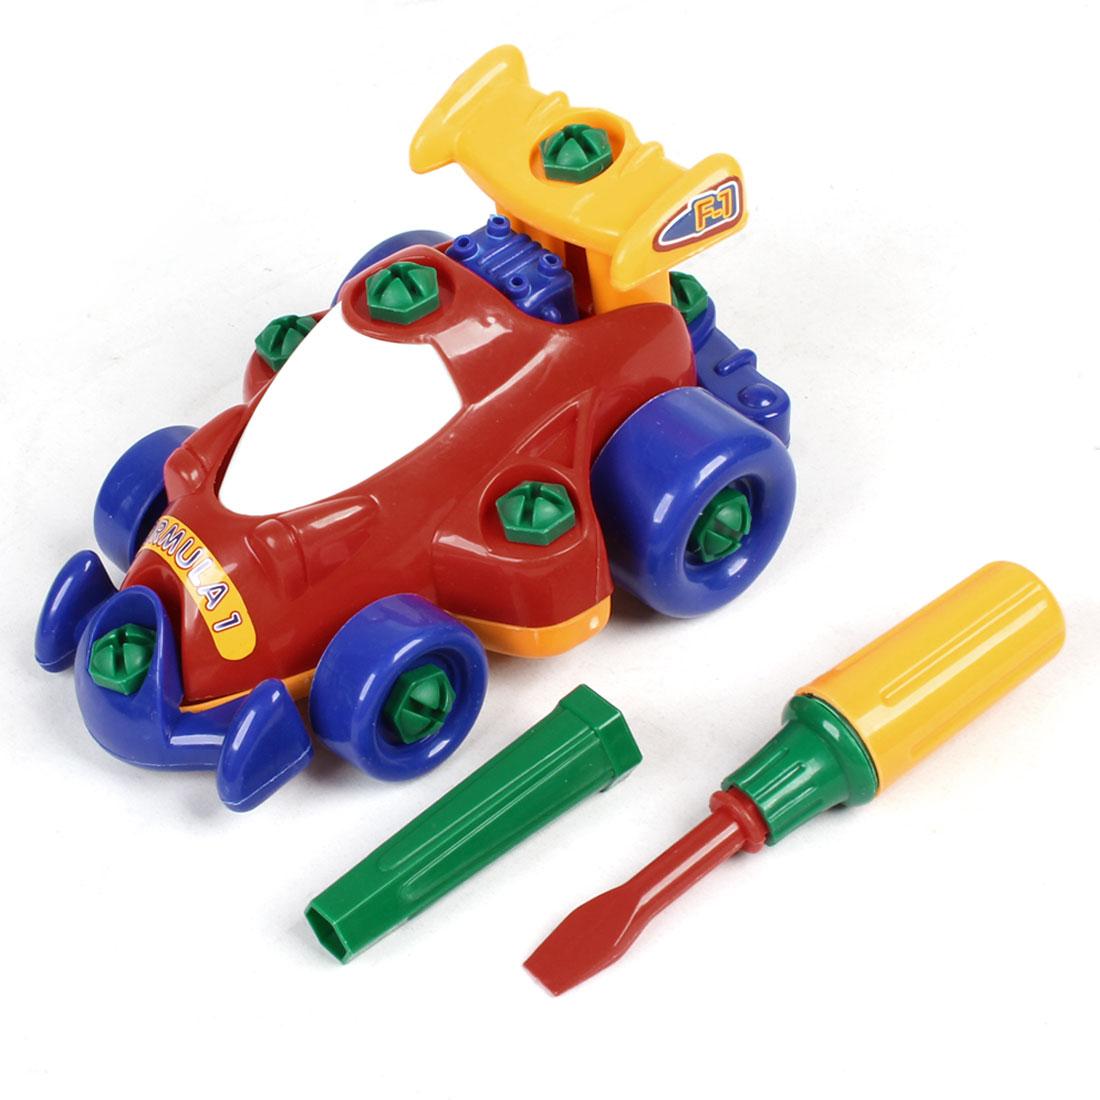 Children-Multicolor-Plastic-Water-Pot-Shovel-Beach-Sand-Pail-Toy-7-in-1